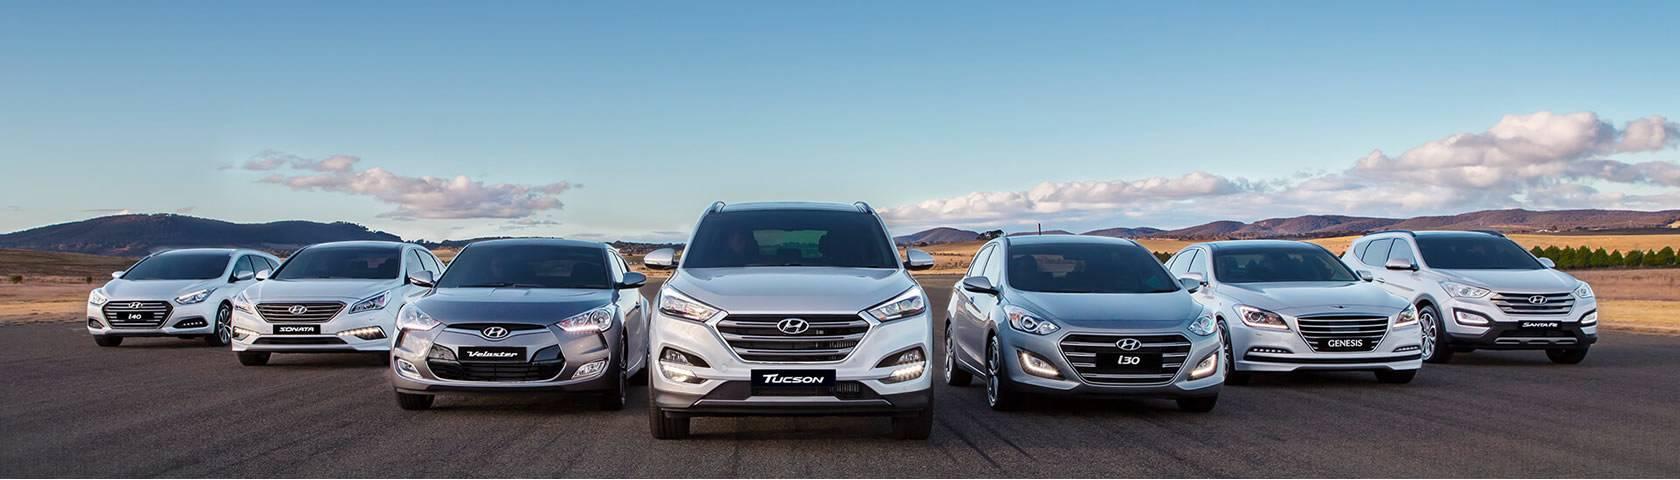 Hyundai Fleet